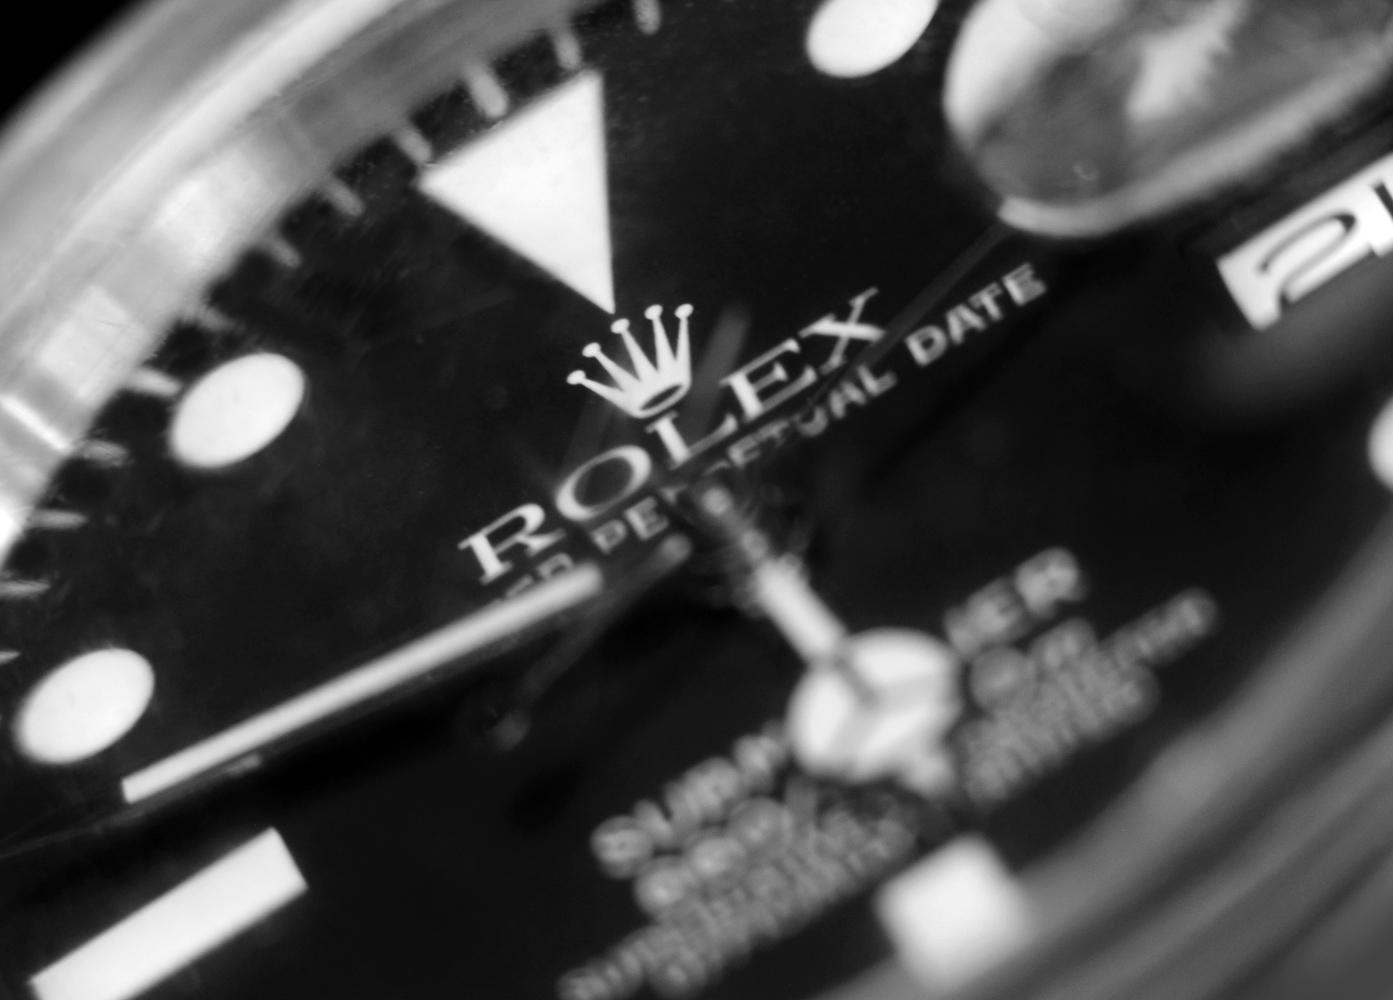 Rolex - Macro - 01 - B&W 2 +30 rotation - resize.jpg